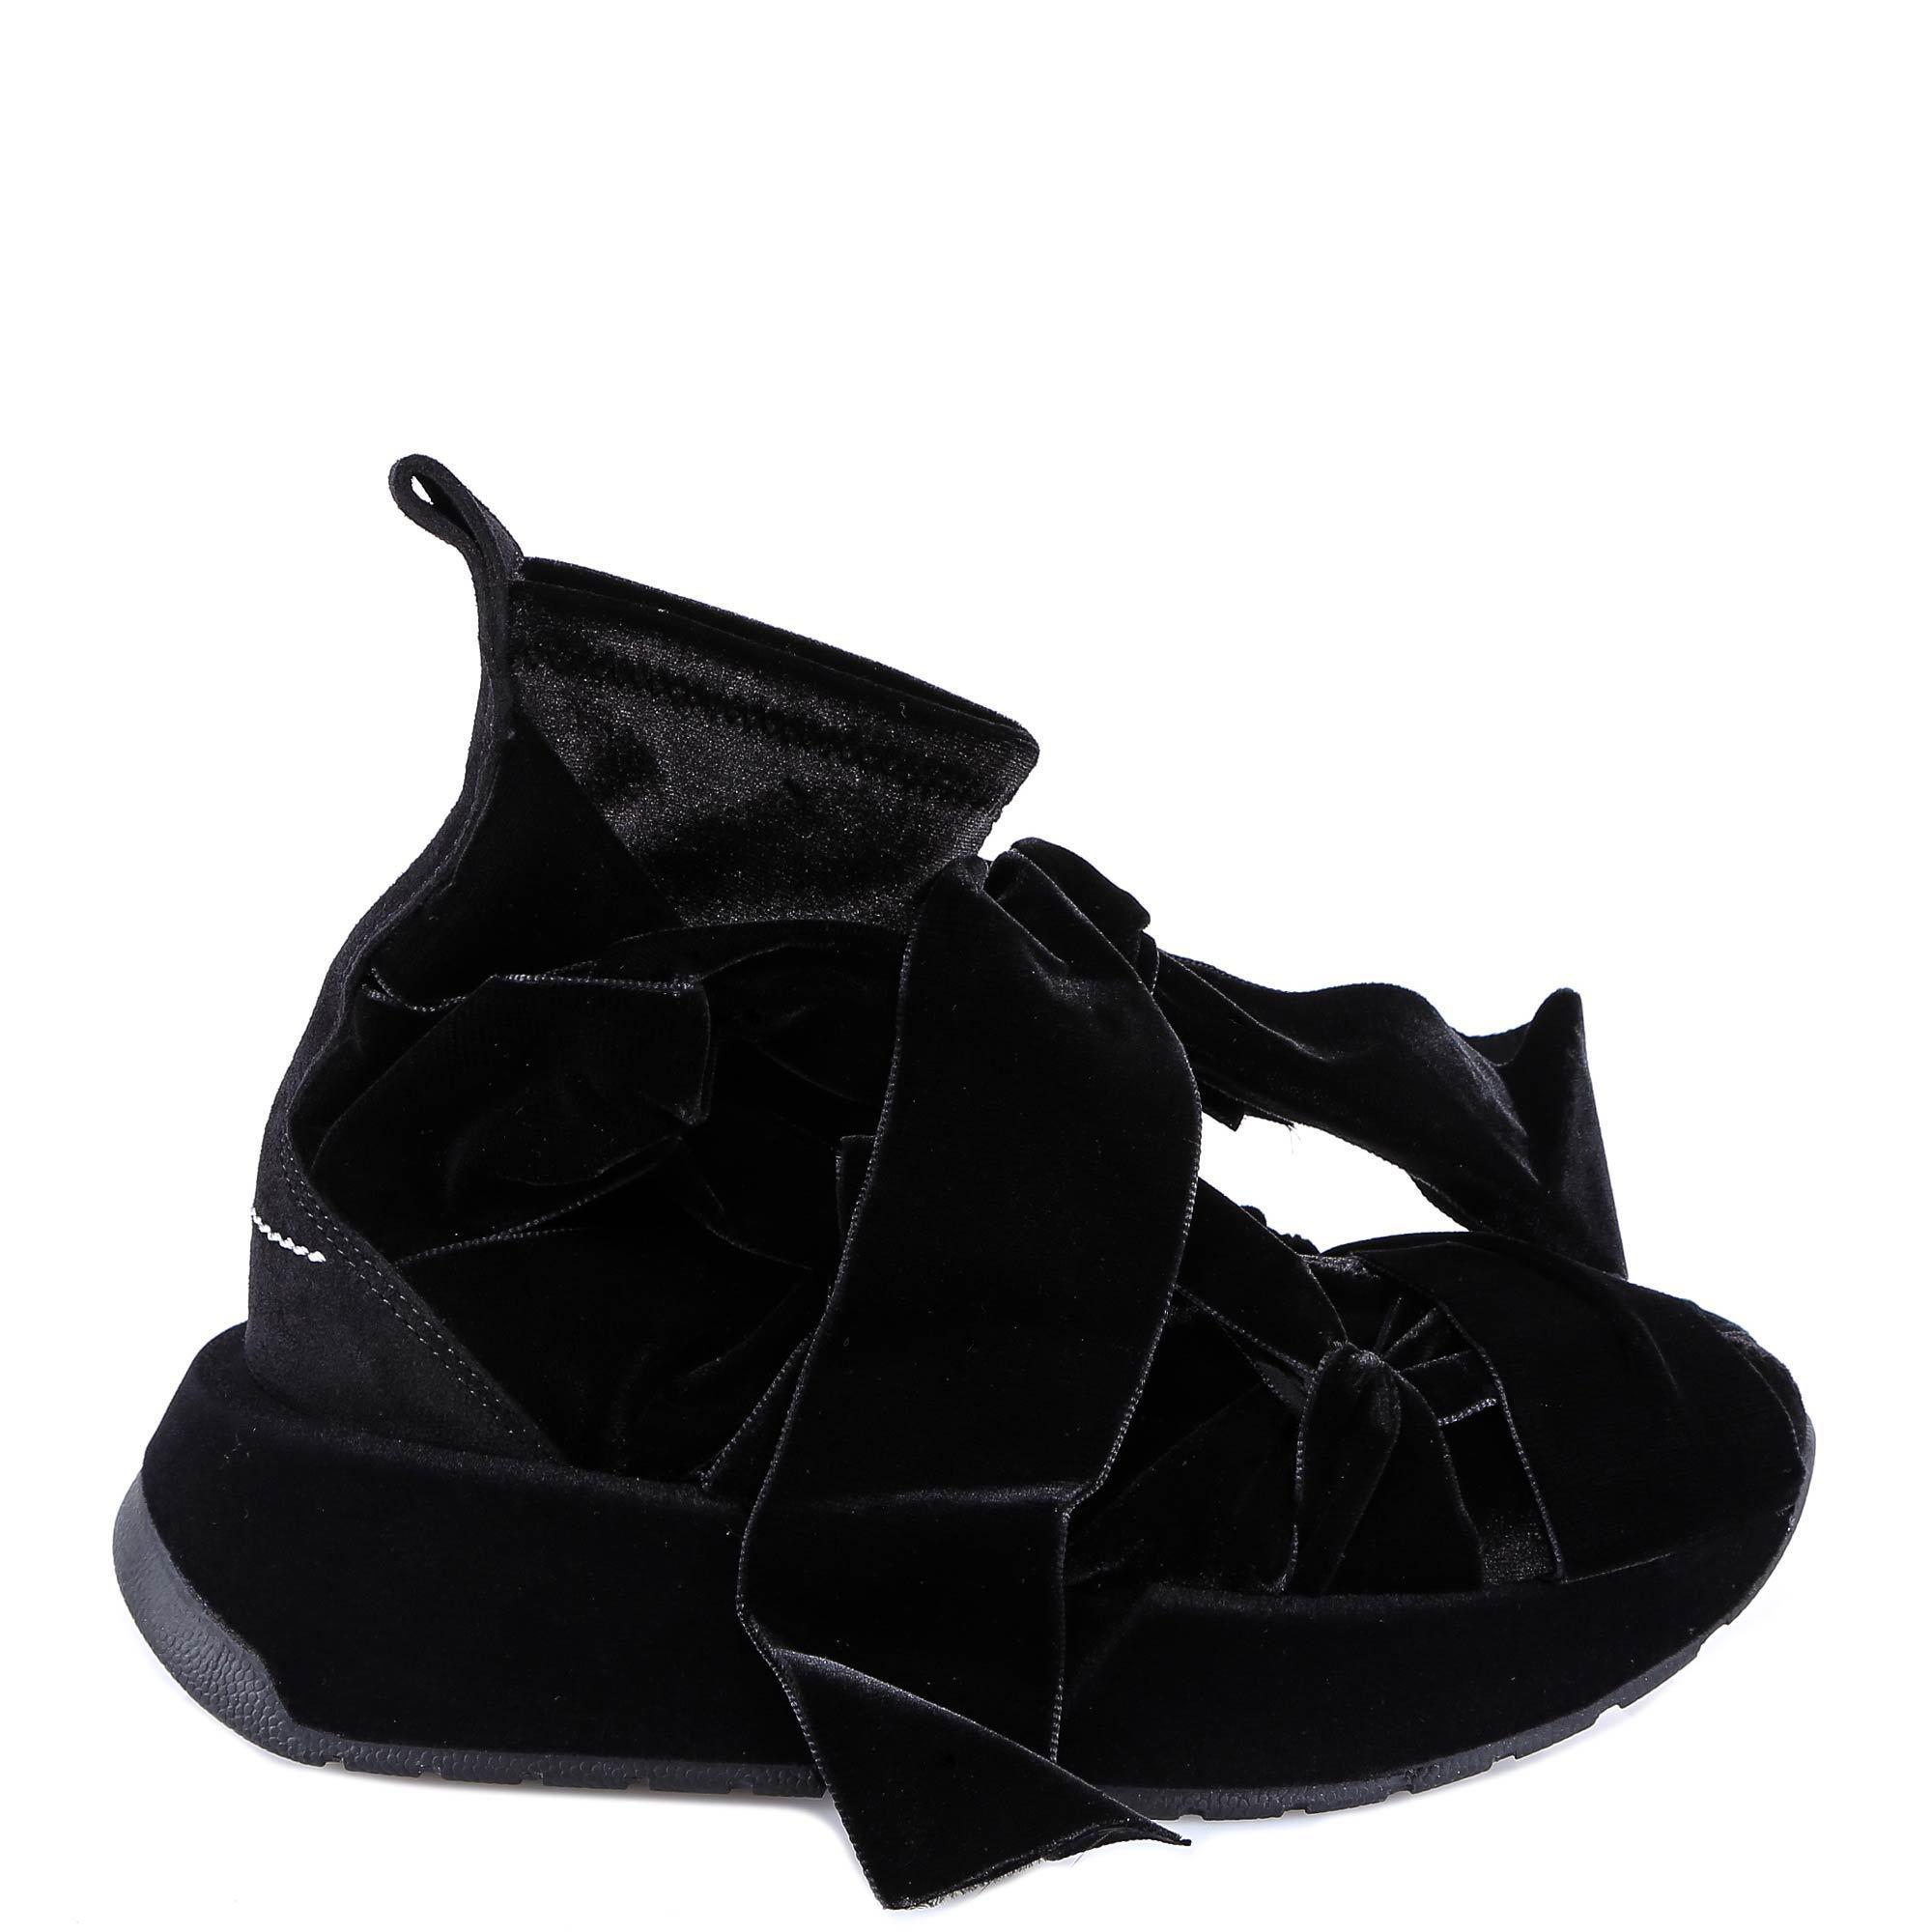 3addd93b7b6f2 Lyst Mm6 By Maison Martin Margiela Bow Sneakers In Black